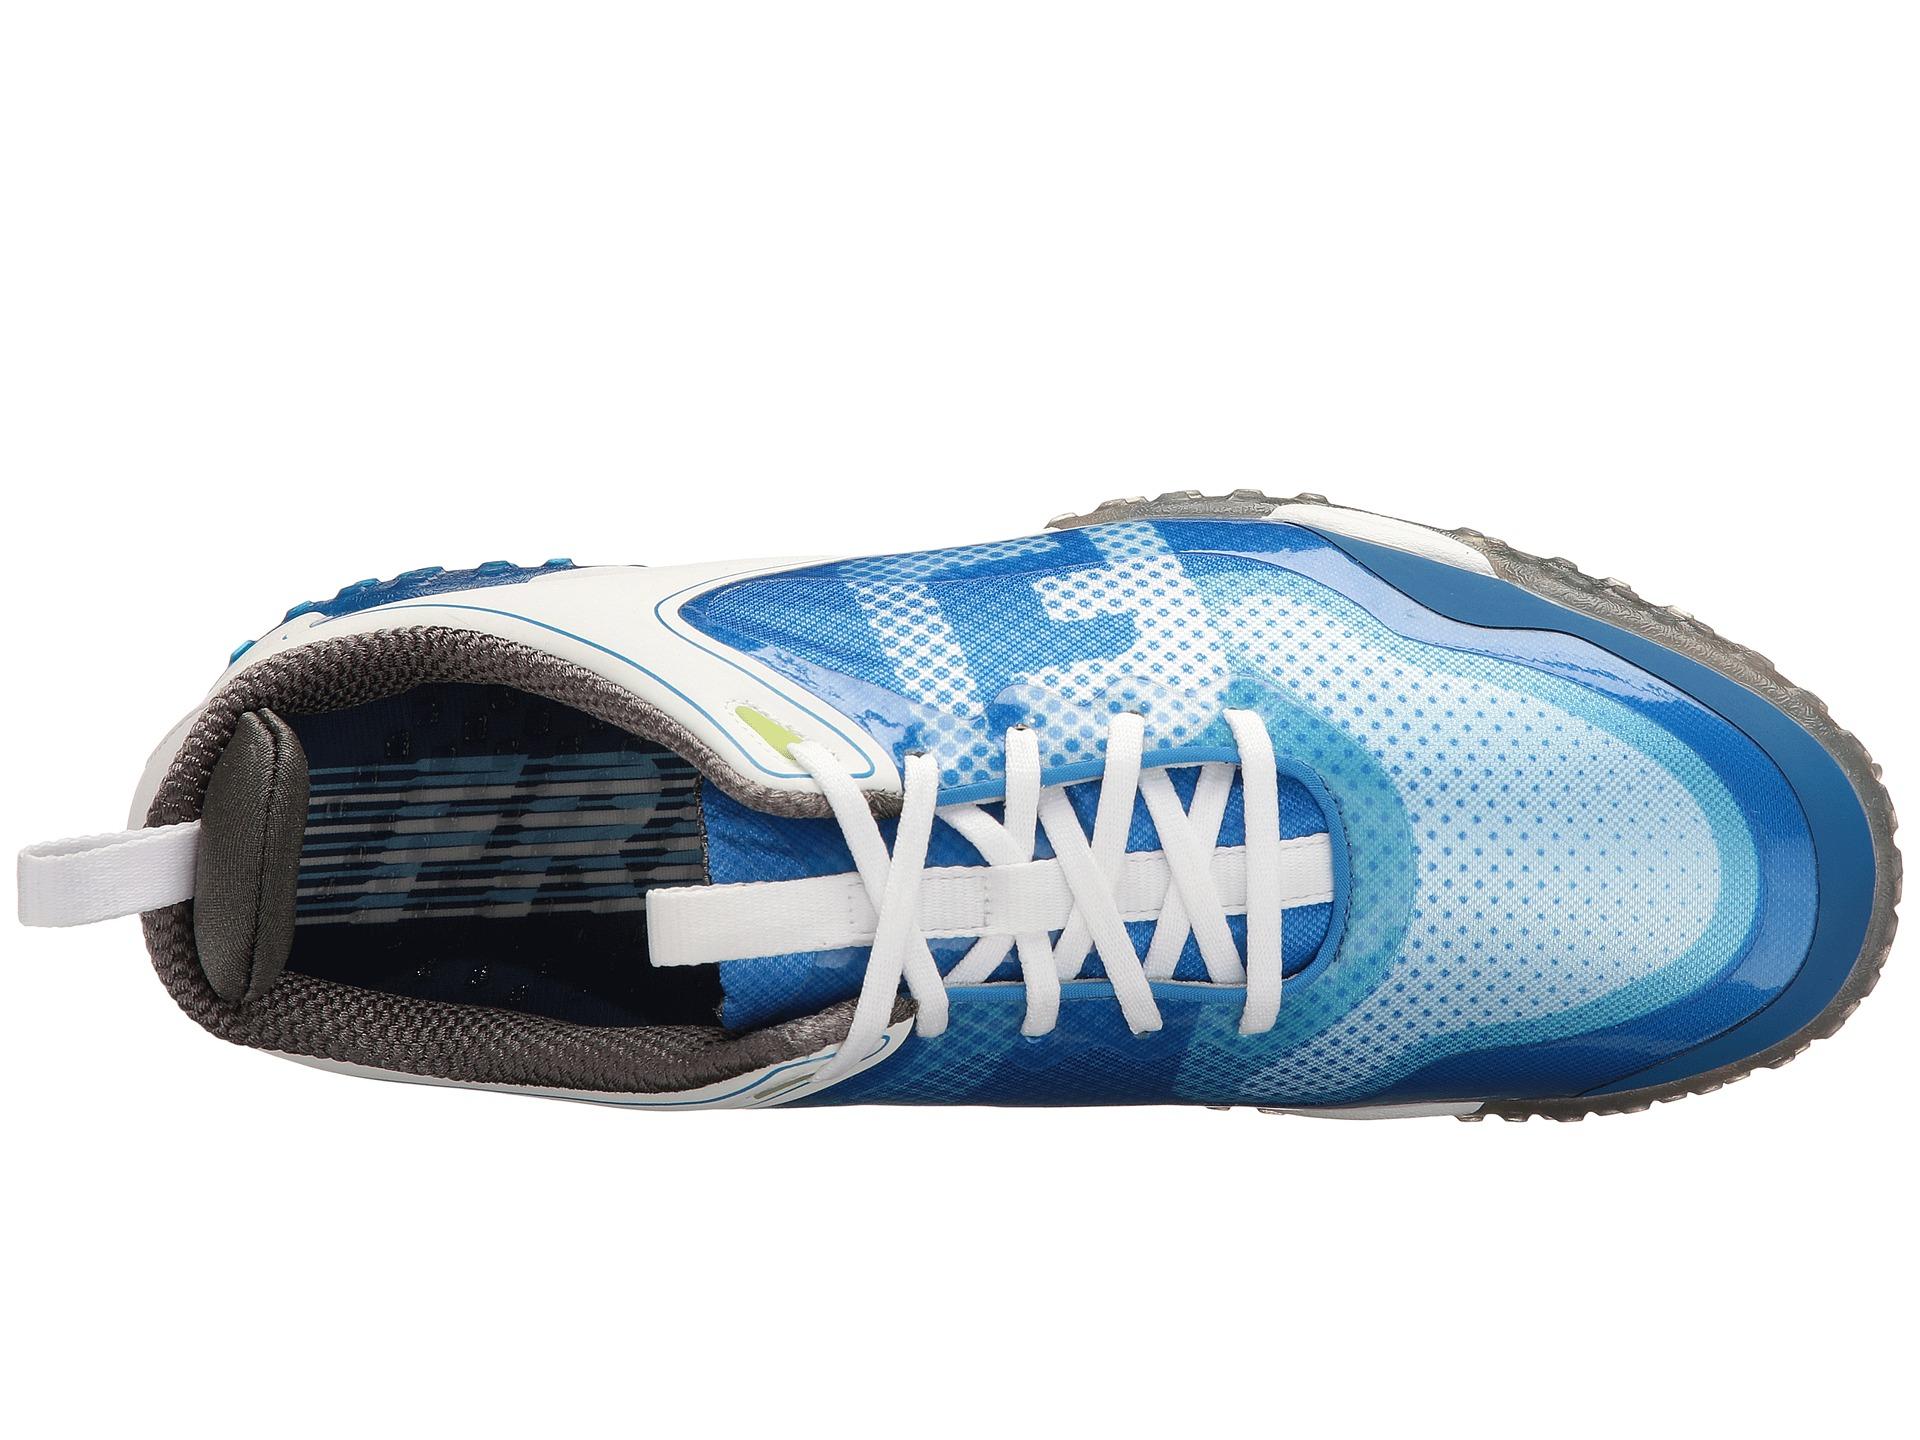 Footjoy White Blue Saddle Golf Shoes For Men